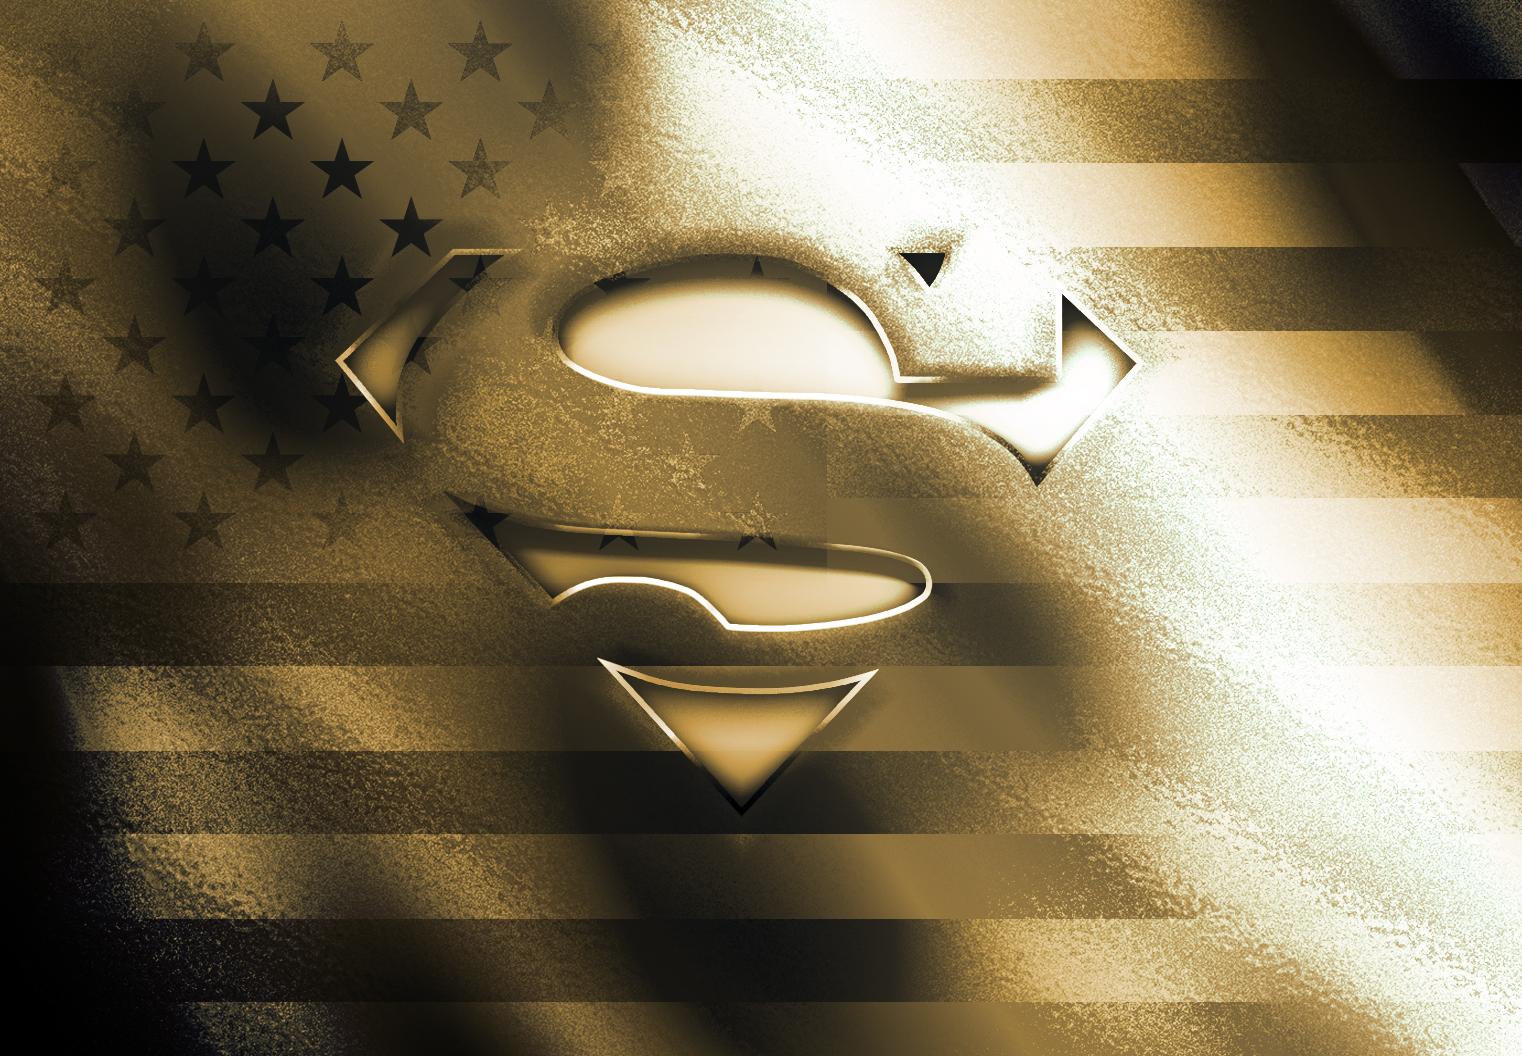 Superman gold american flag by wayanoru on deviantart superman gold american flag by wayanoru superman gold american flag by wayanoru voltagebd Gallery